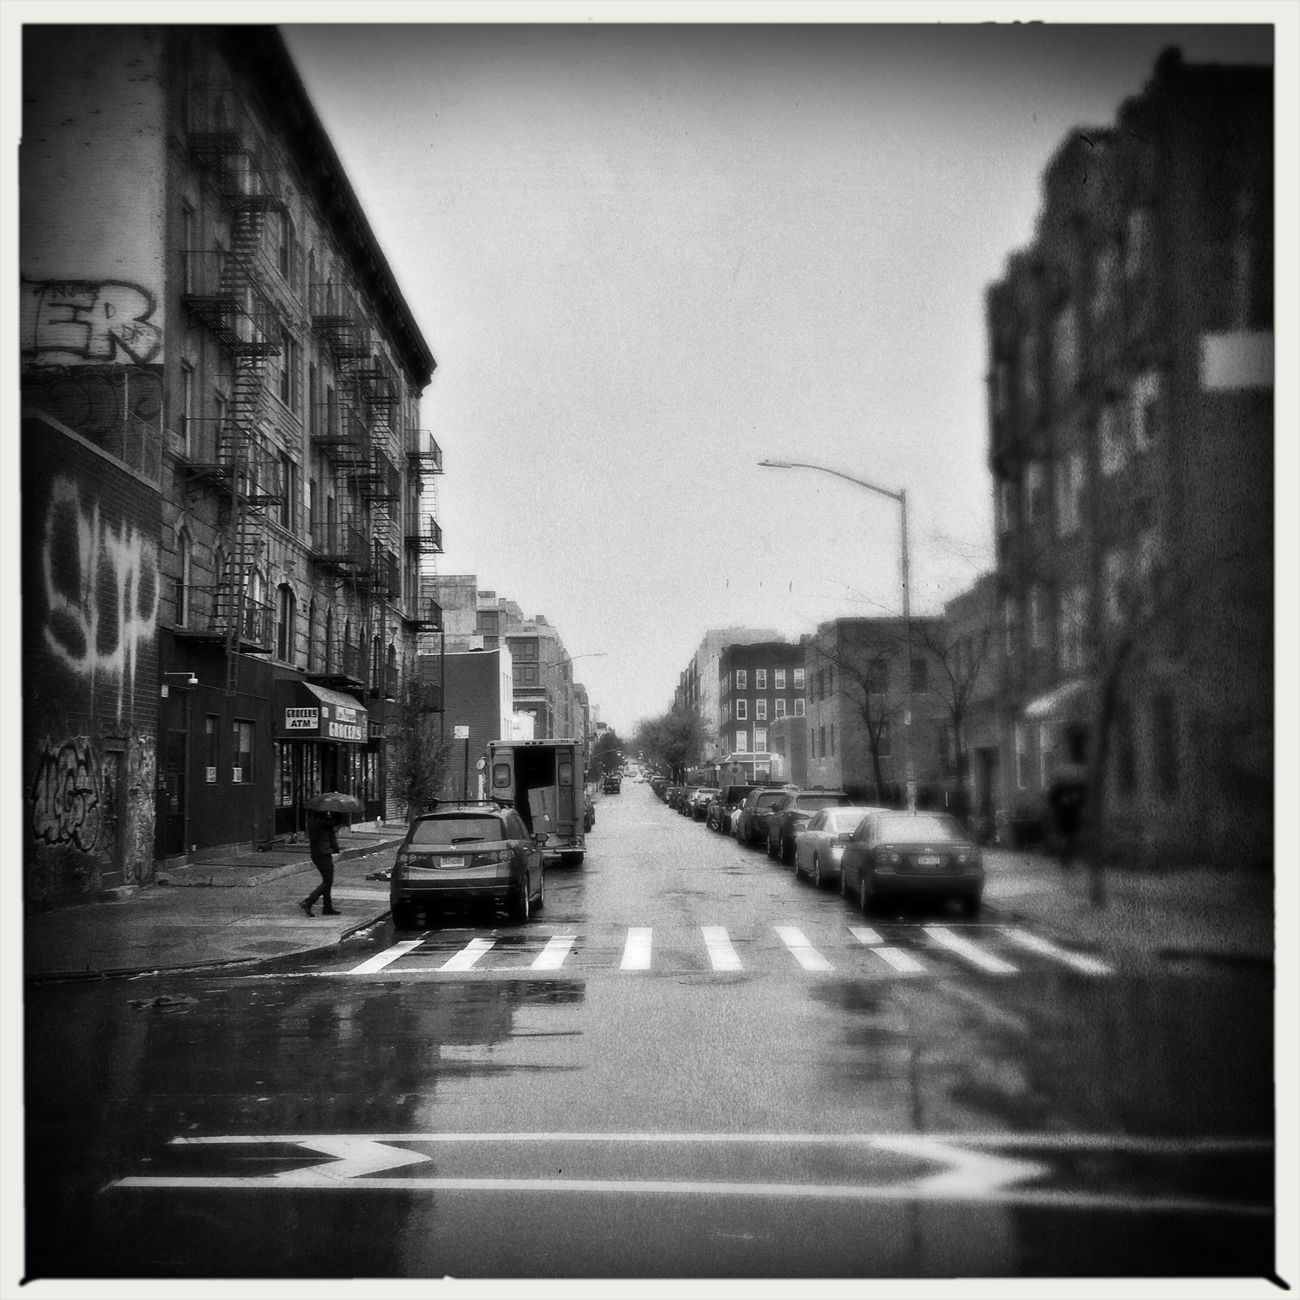 Rainy Morning Urbanphotography Architecture Brooklyn Urban Landscape New York City Street Photography IPhoneography Cityscape Rain Blackandwhite